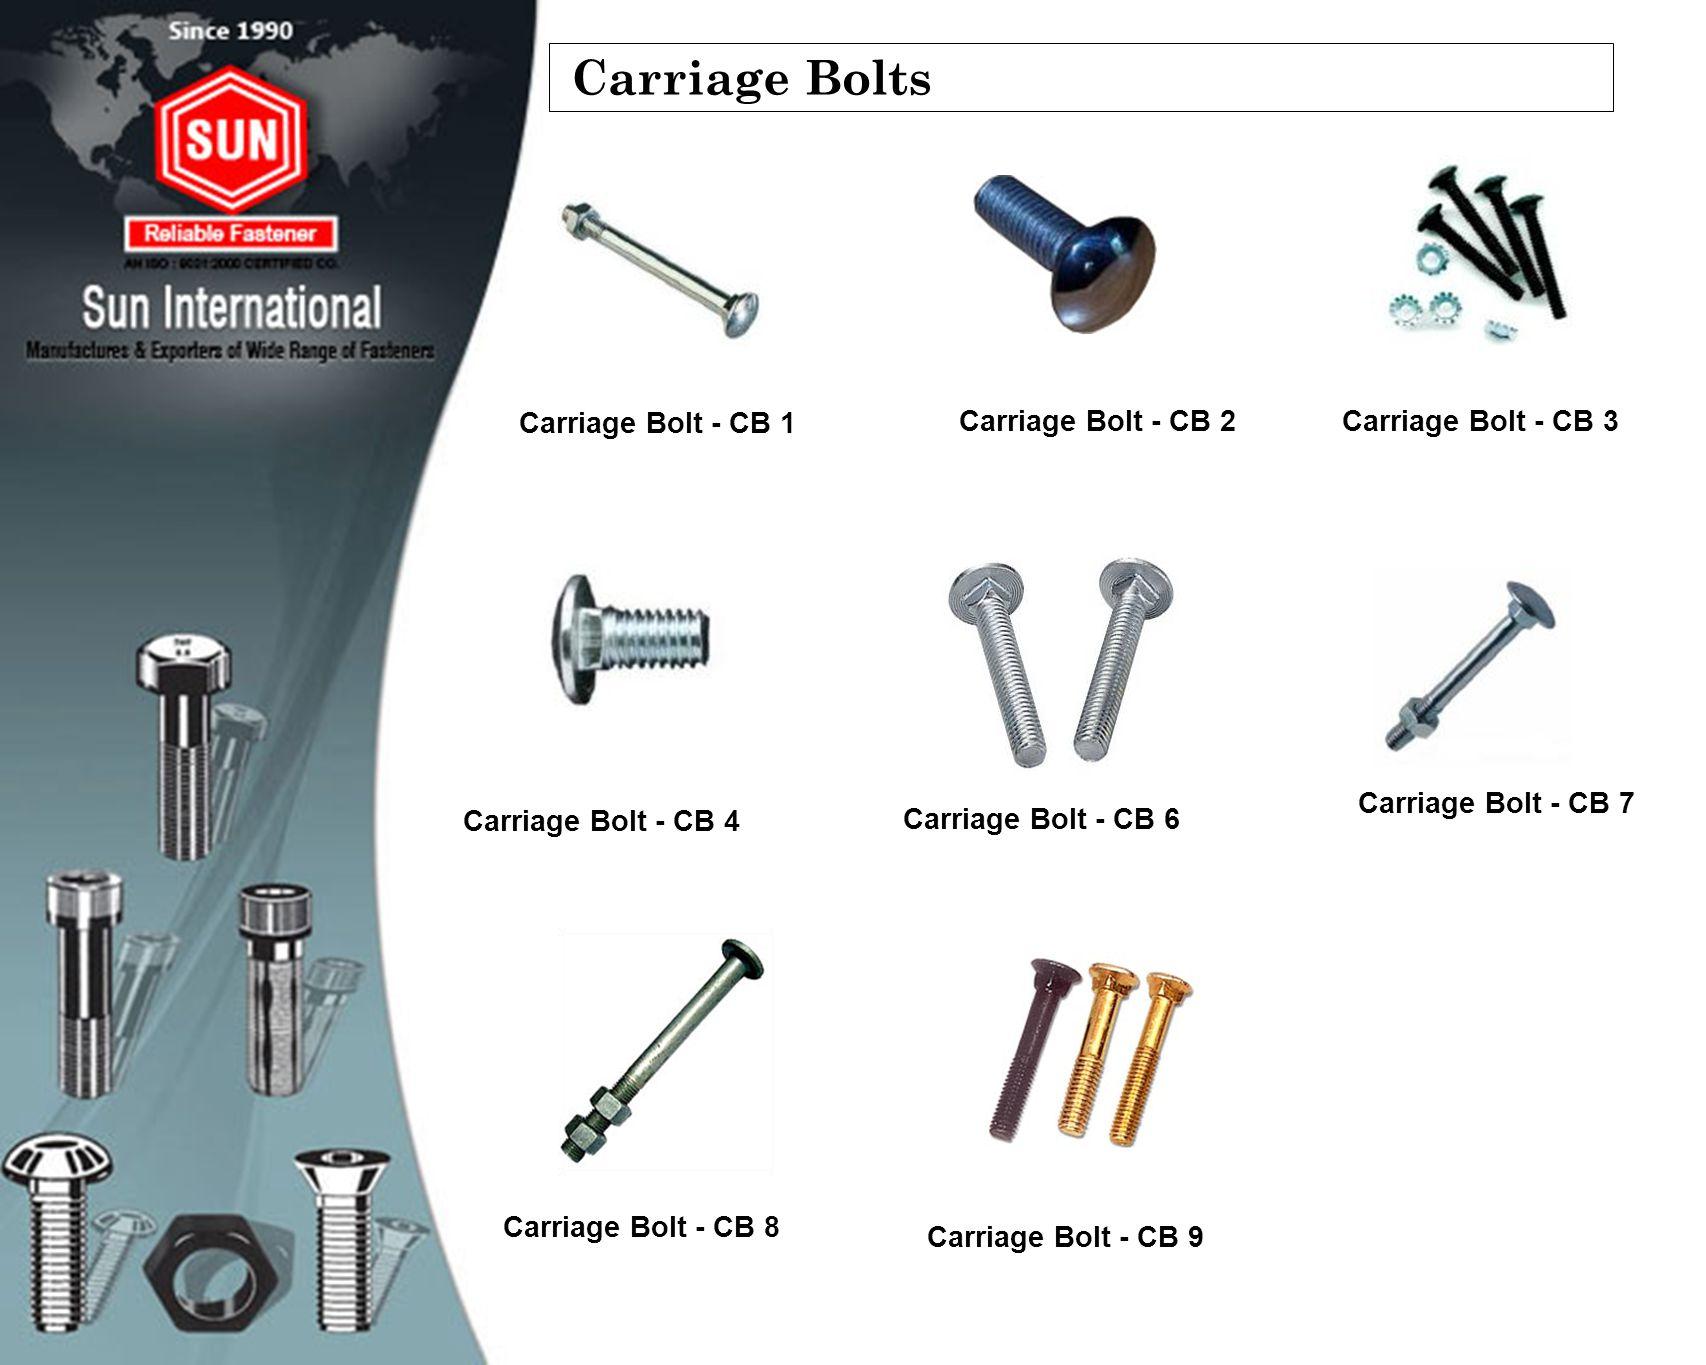 Carriage Bolts Carriage Bolt - CB 1 Carriage Bolt - CB 2